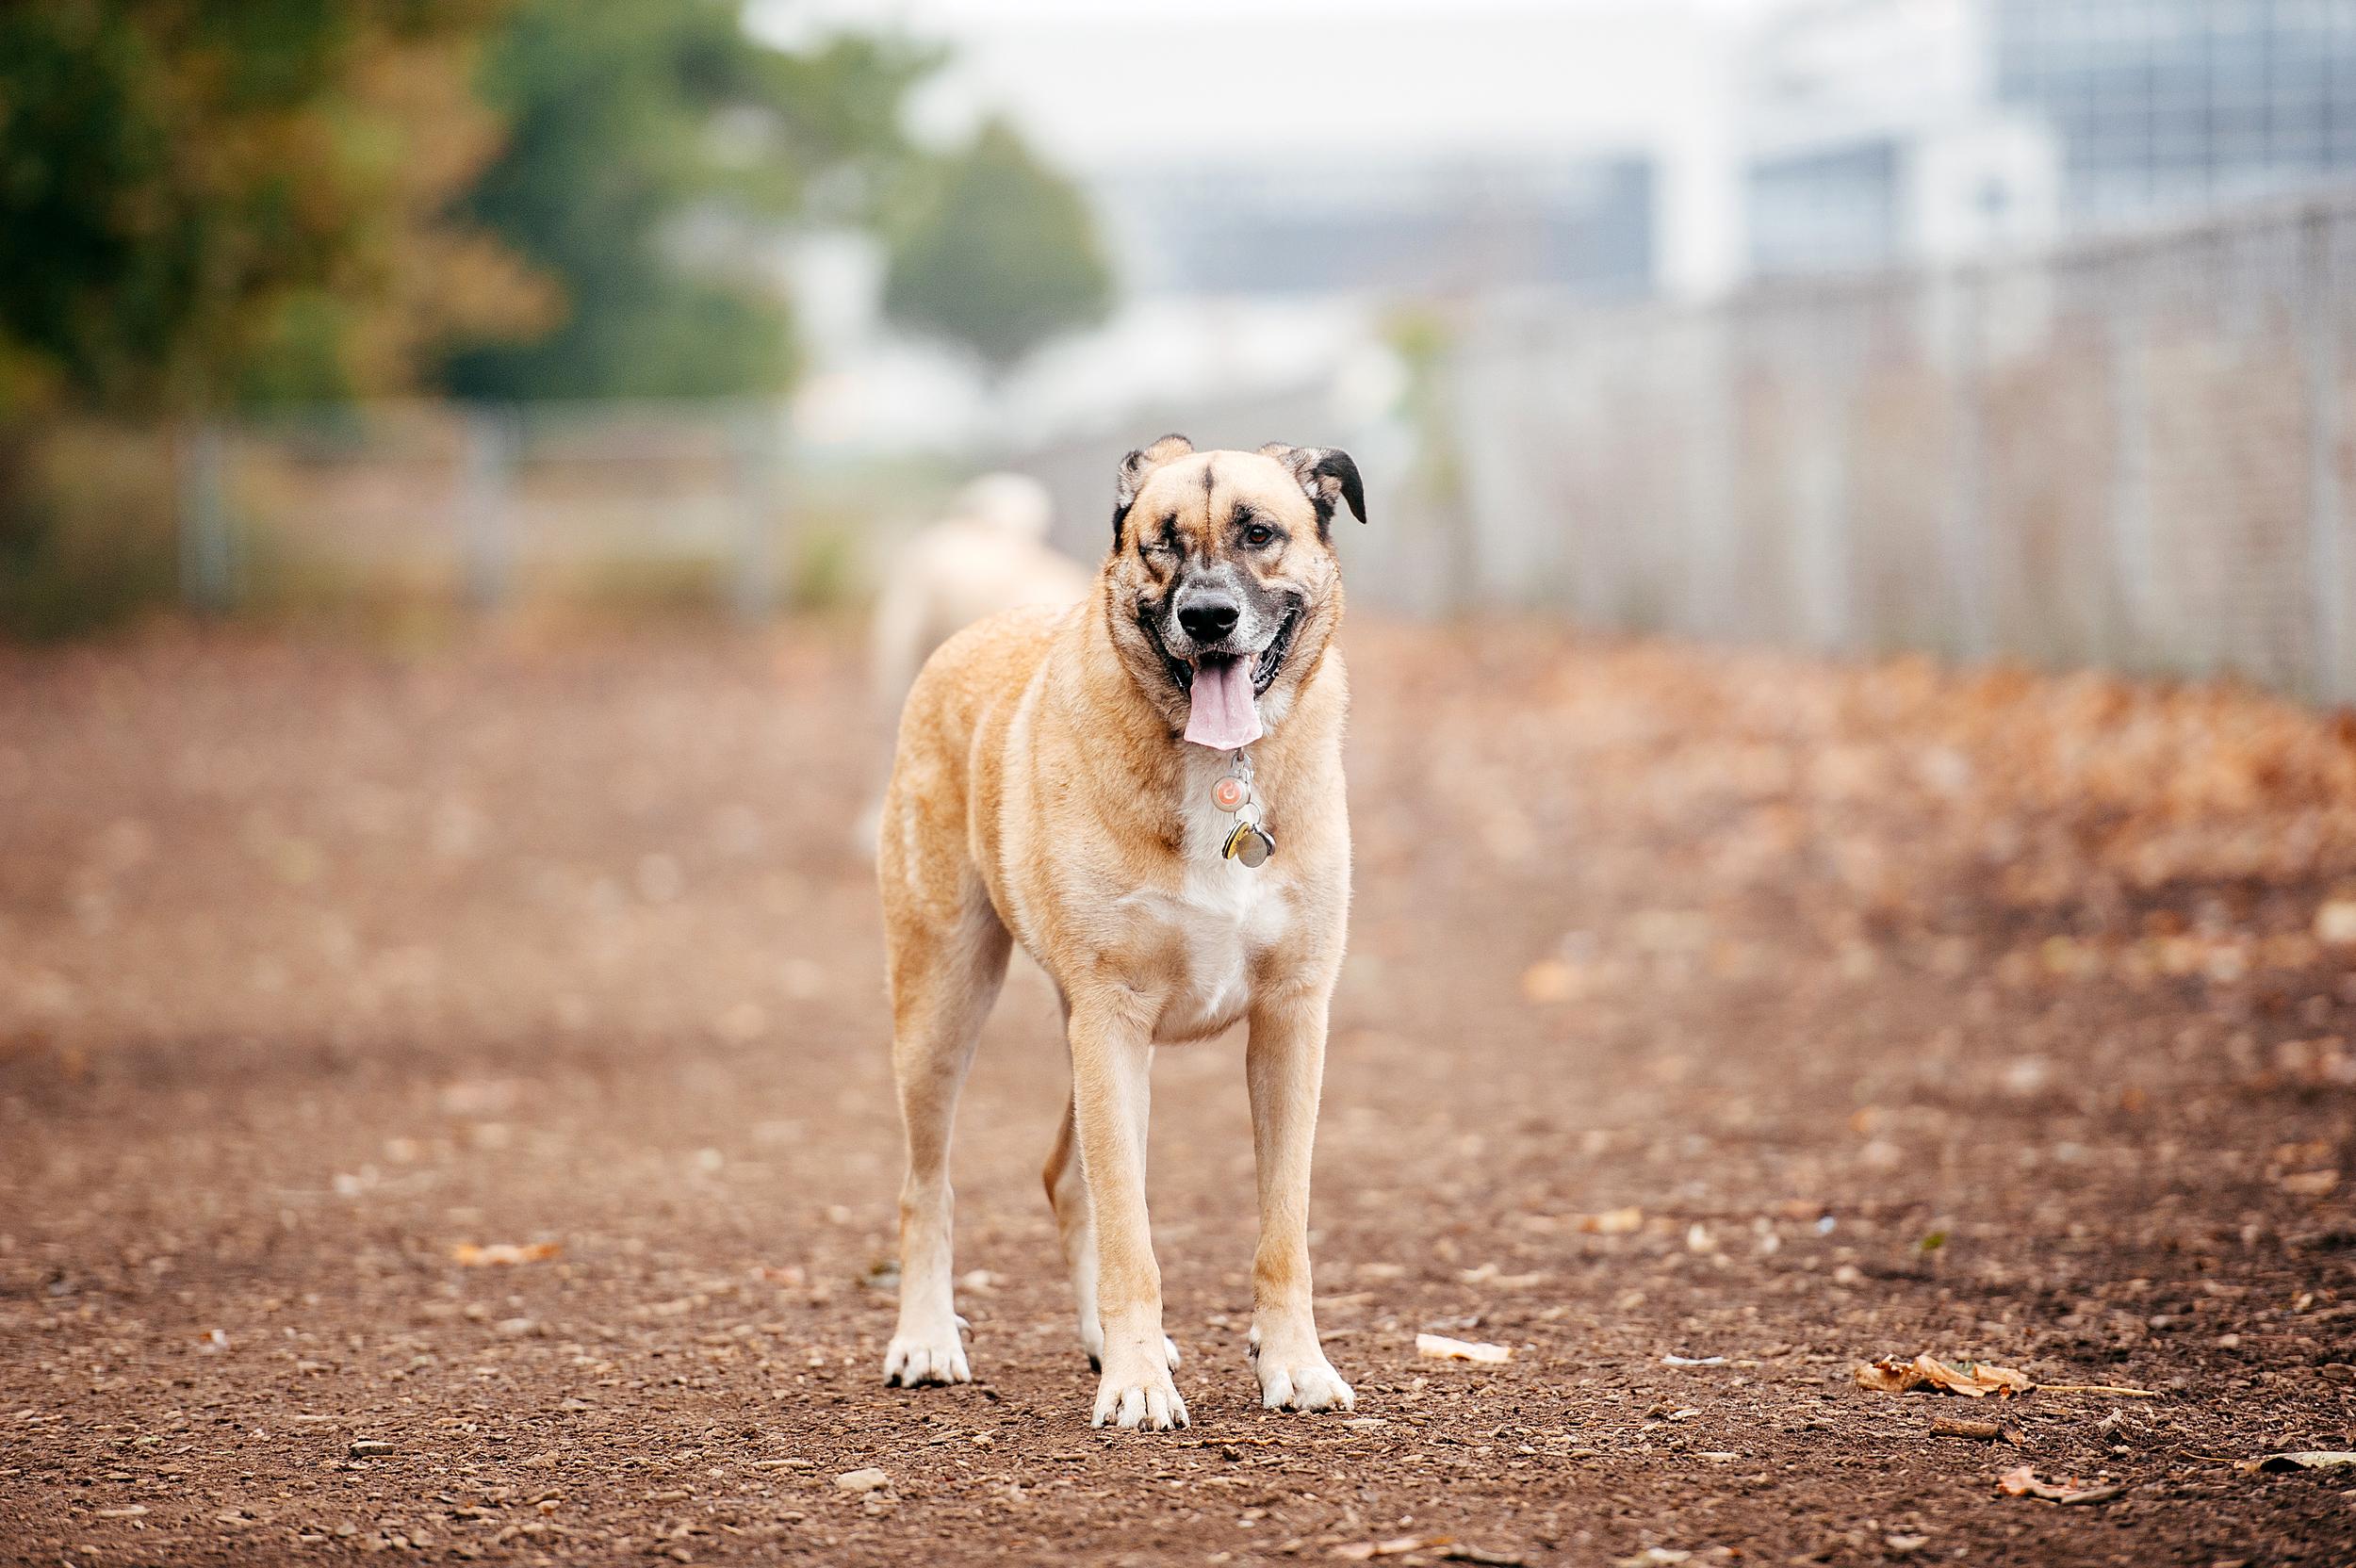 bernard-dog-run-pittsburgh-walsh02.jpg